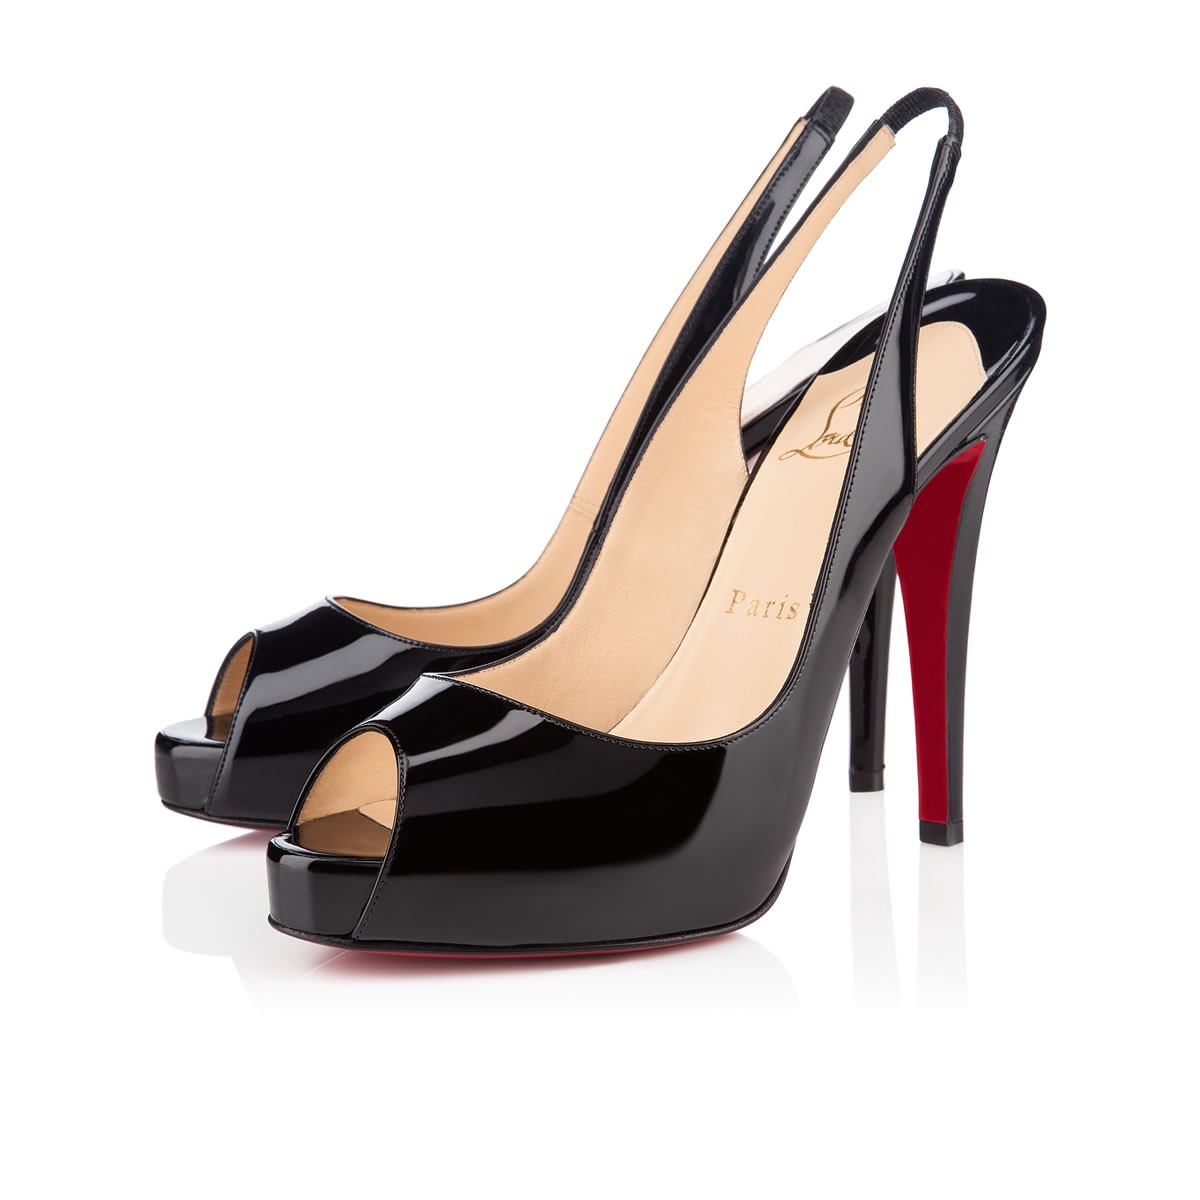 Christian Louboutin Womens Shoes Australia